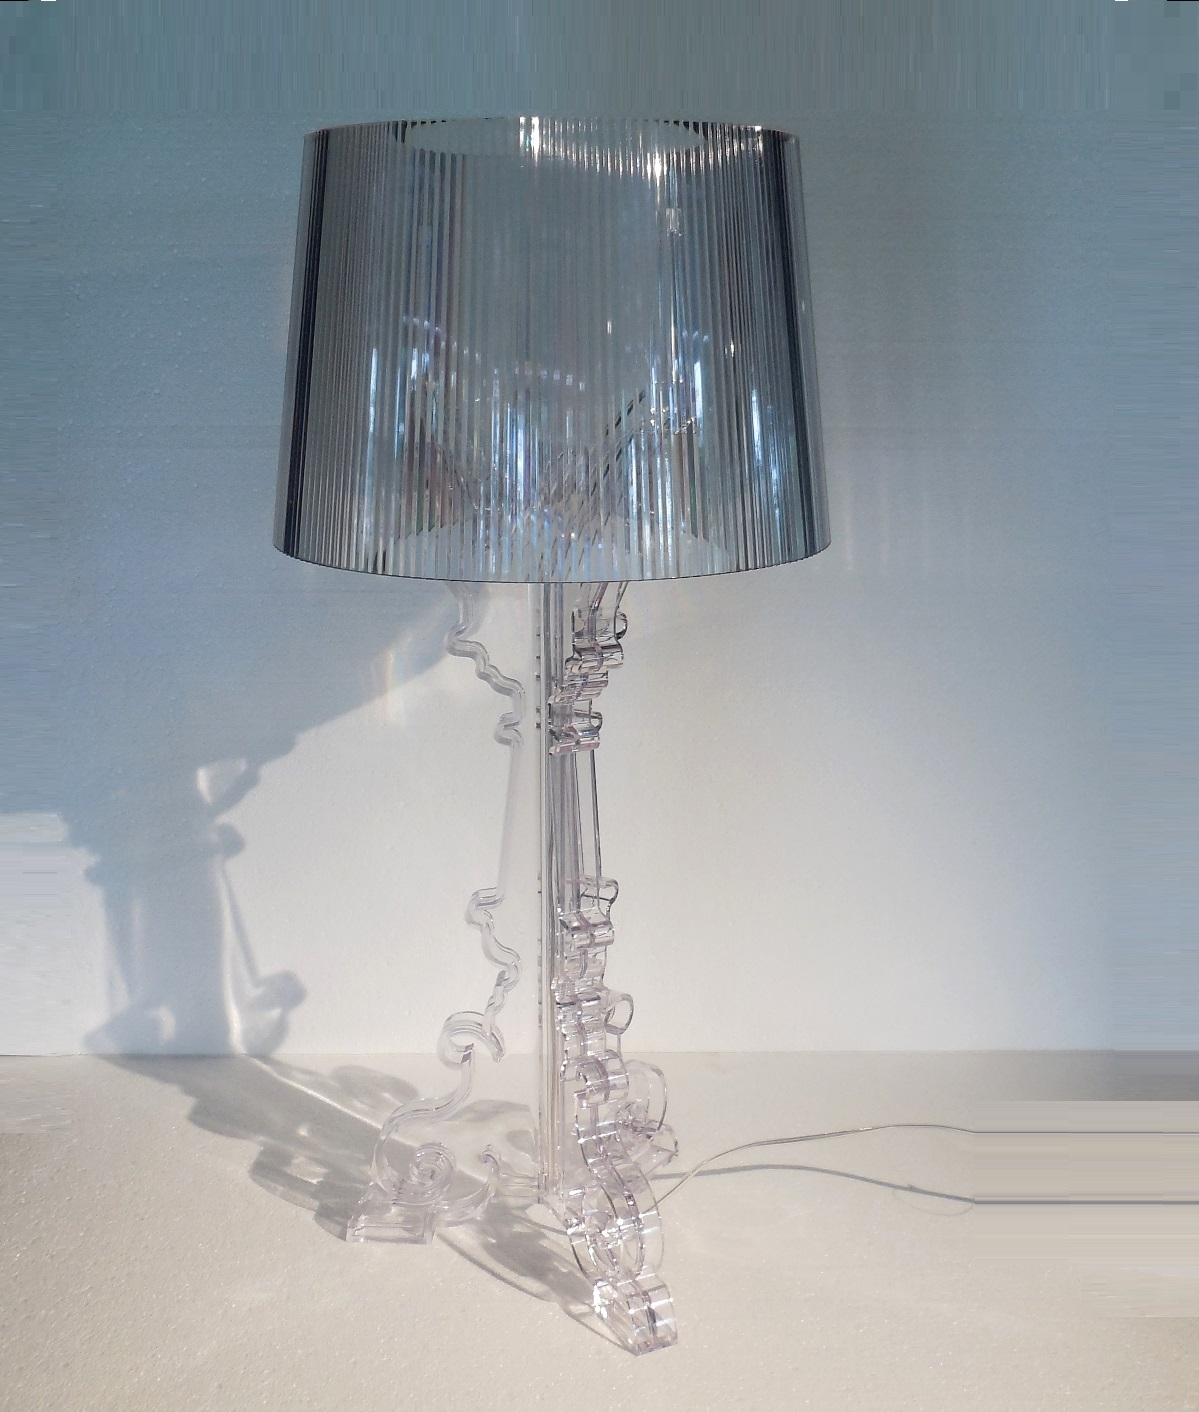 Illuminazione Kartell Trovaprezzi kartell , bourgie lampada da tavolo cristal...